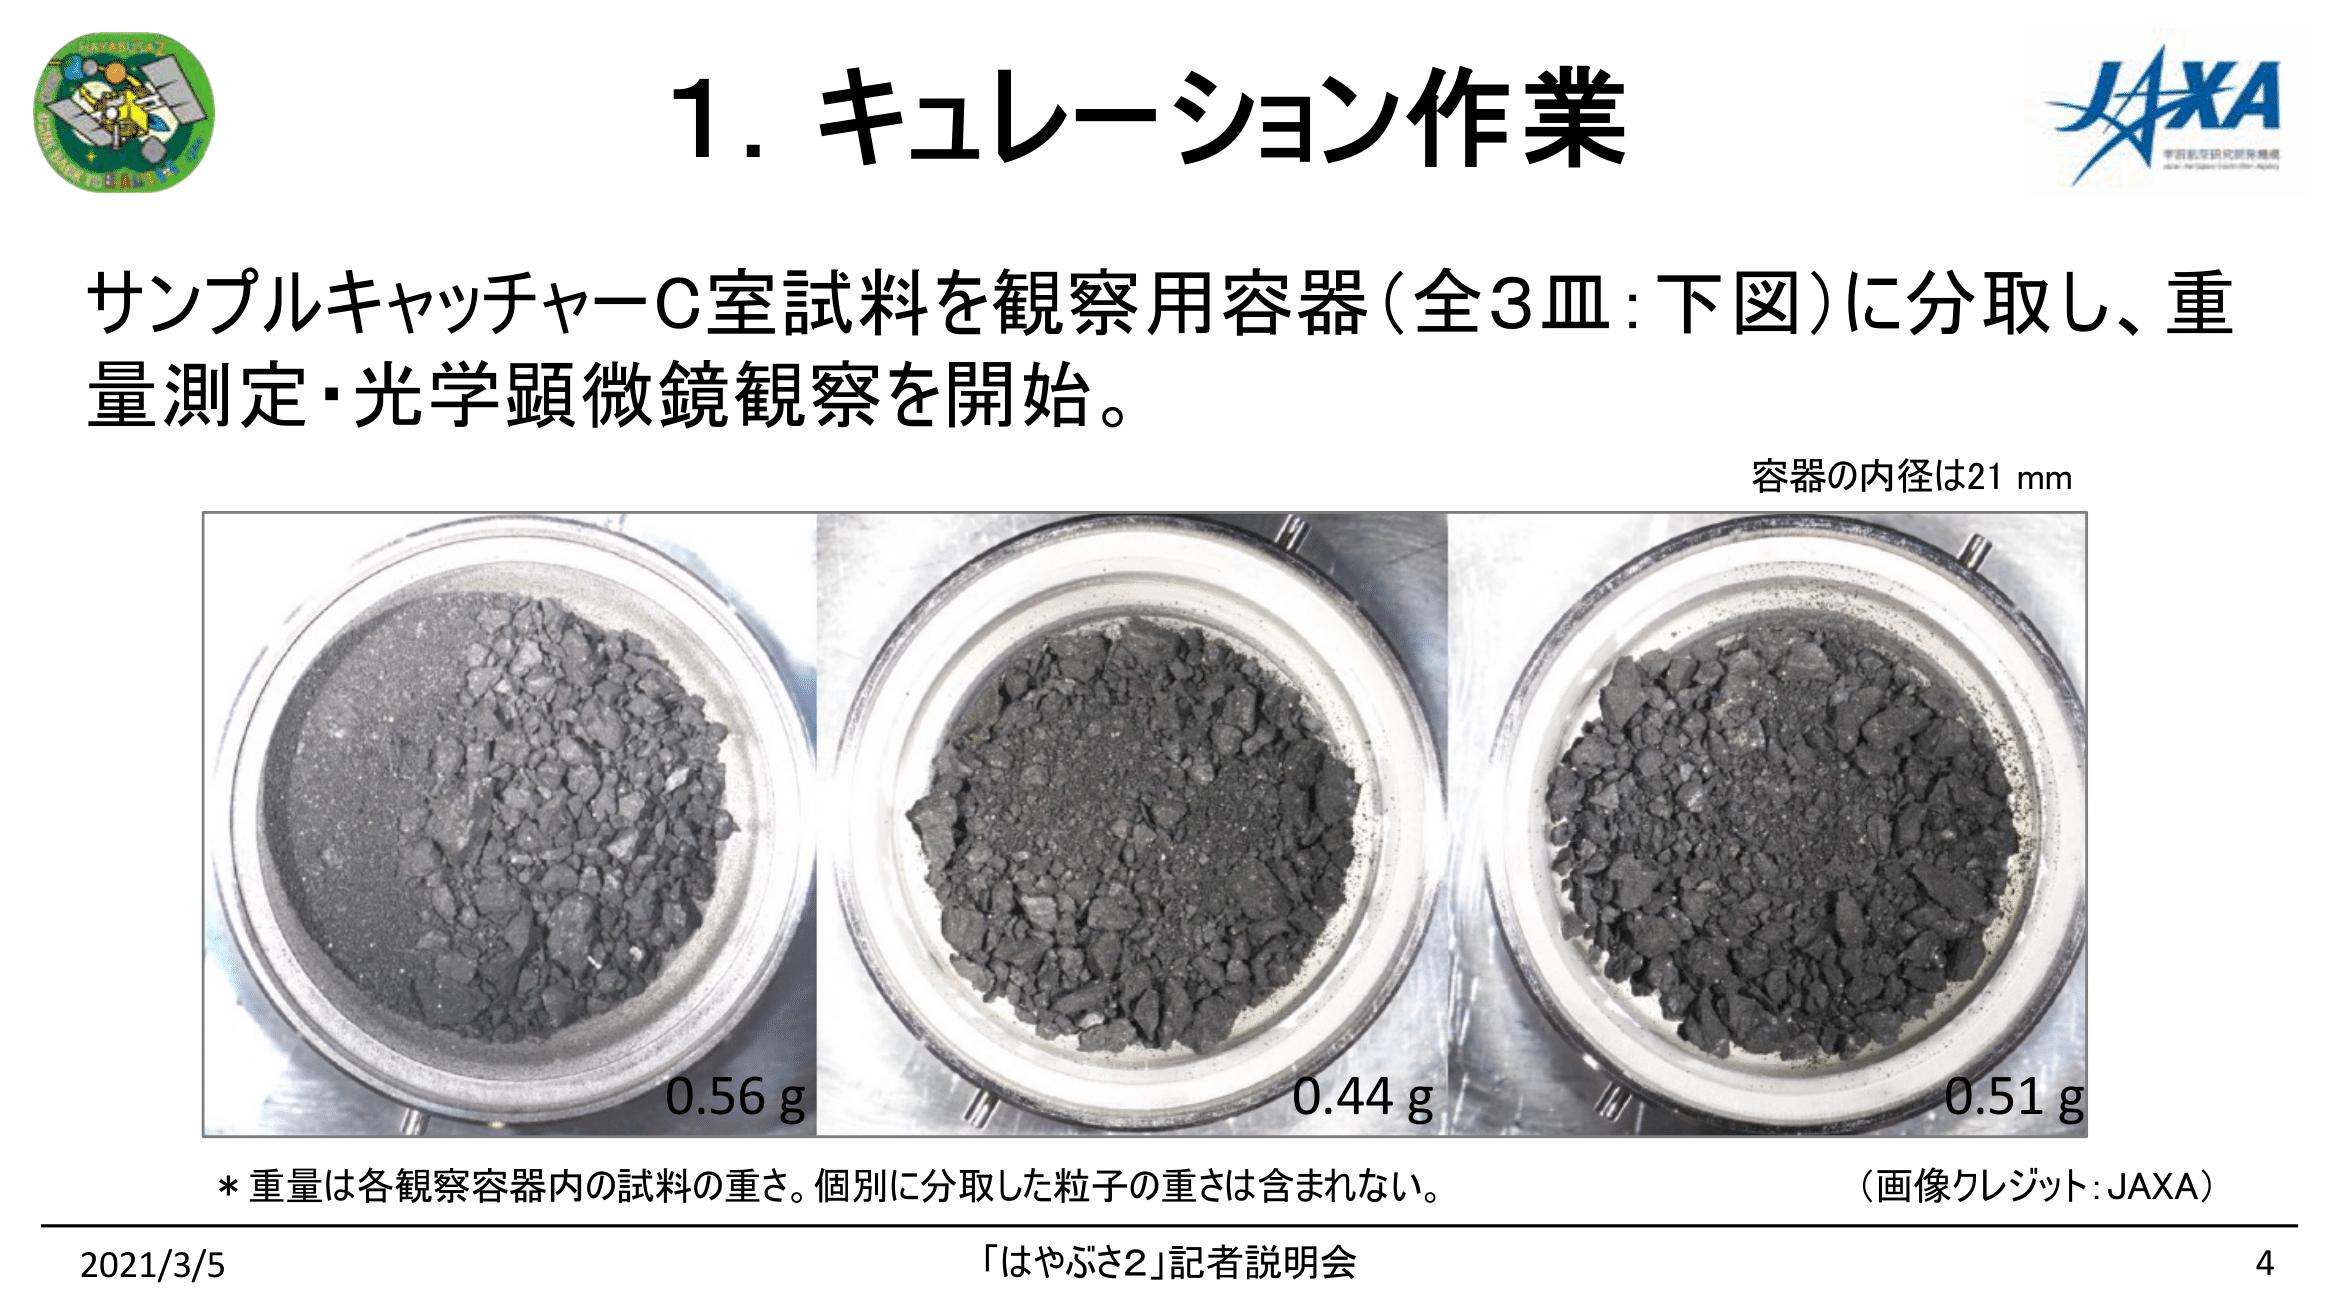 f:id:Imamura:20210305134018p:plain